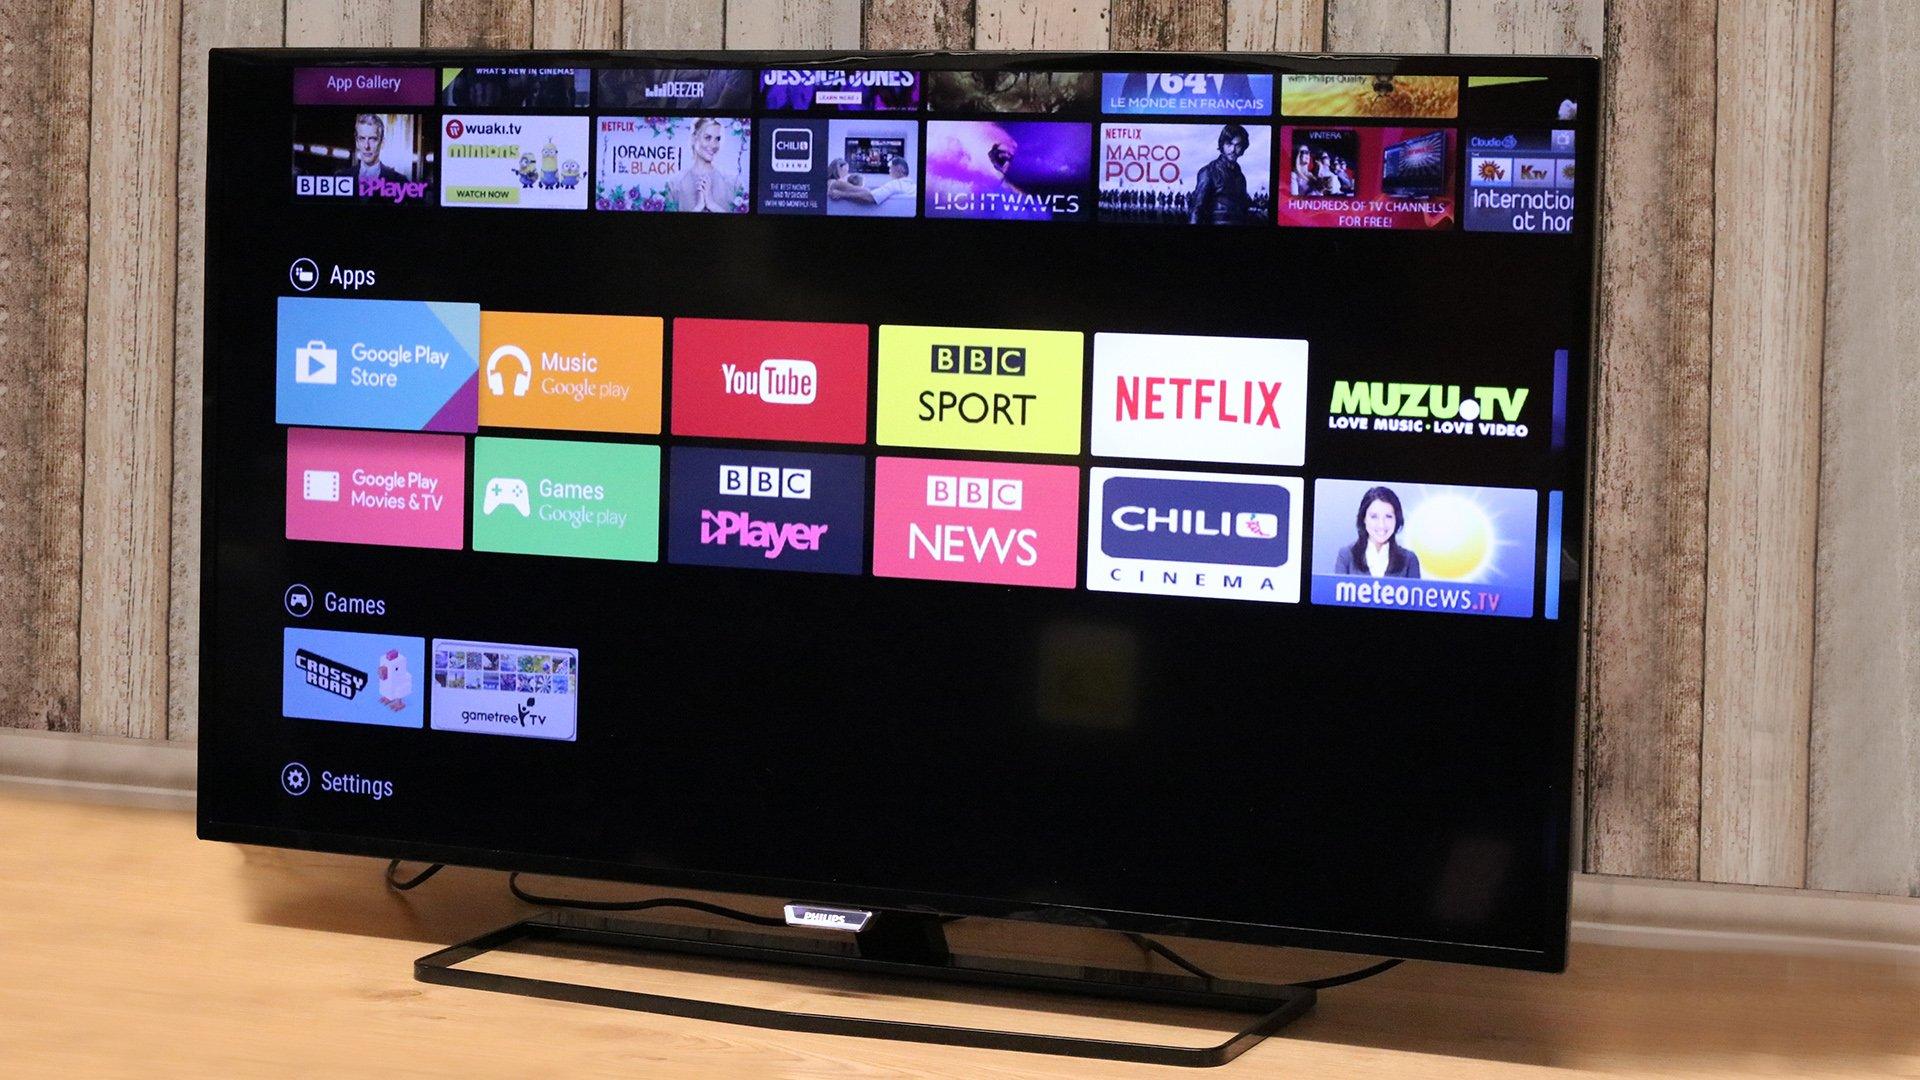 philips 6400 series 4k tv 40put6400 review expert reviews. Black Bedroom Furniture Sets. Home Design Ideas